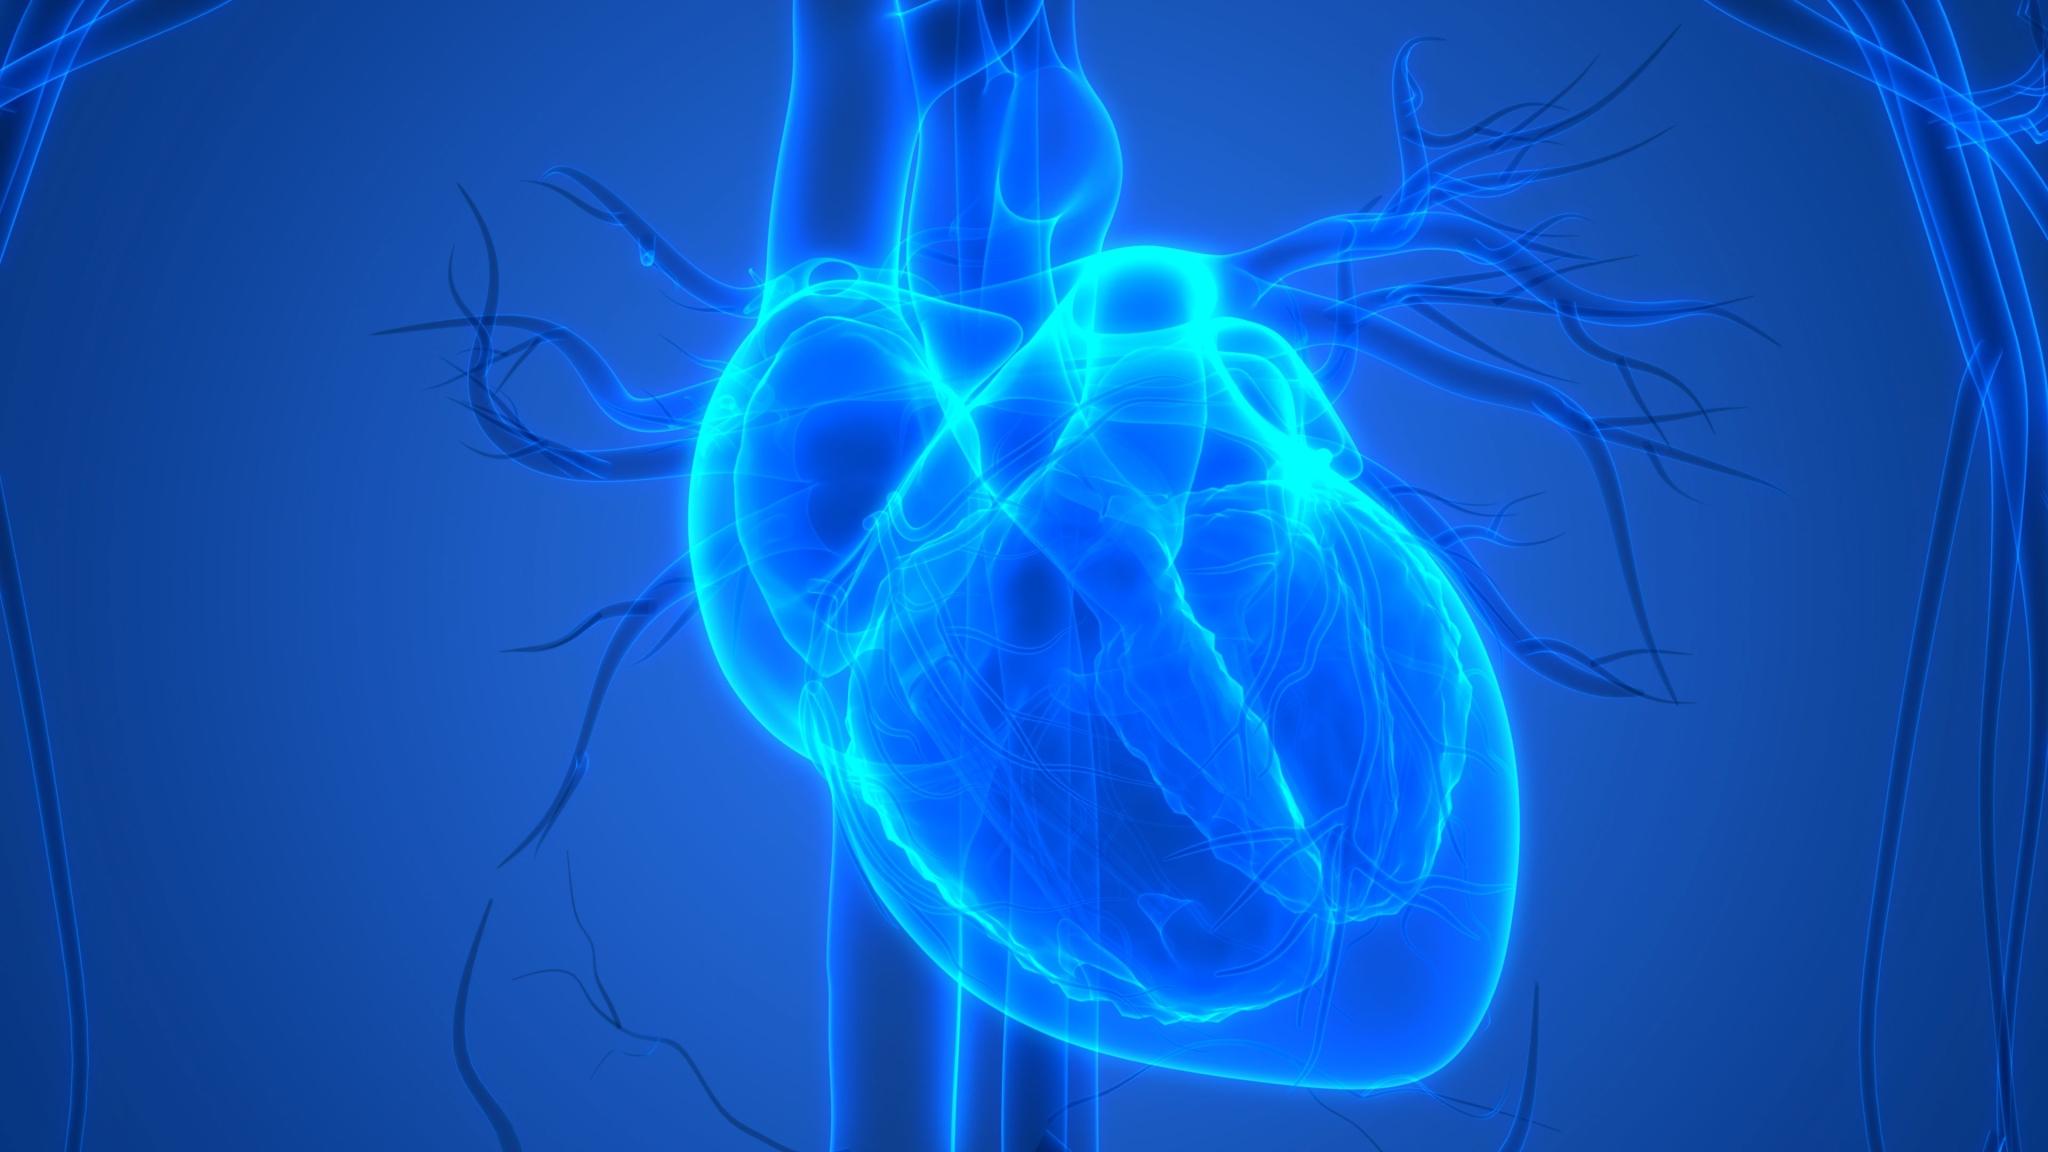 Sitting More May Raise Heart Disease Risk in Older Women